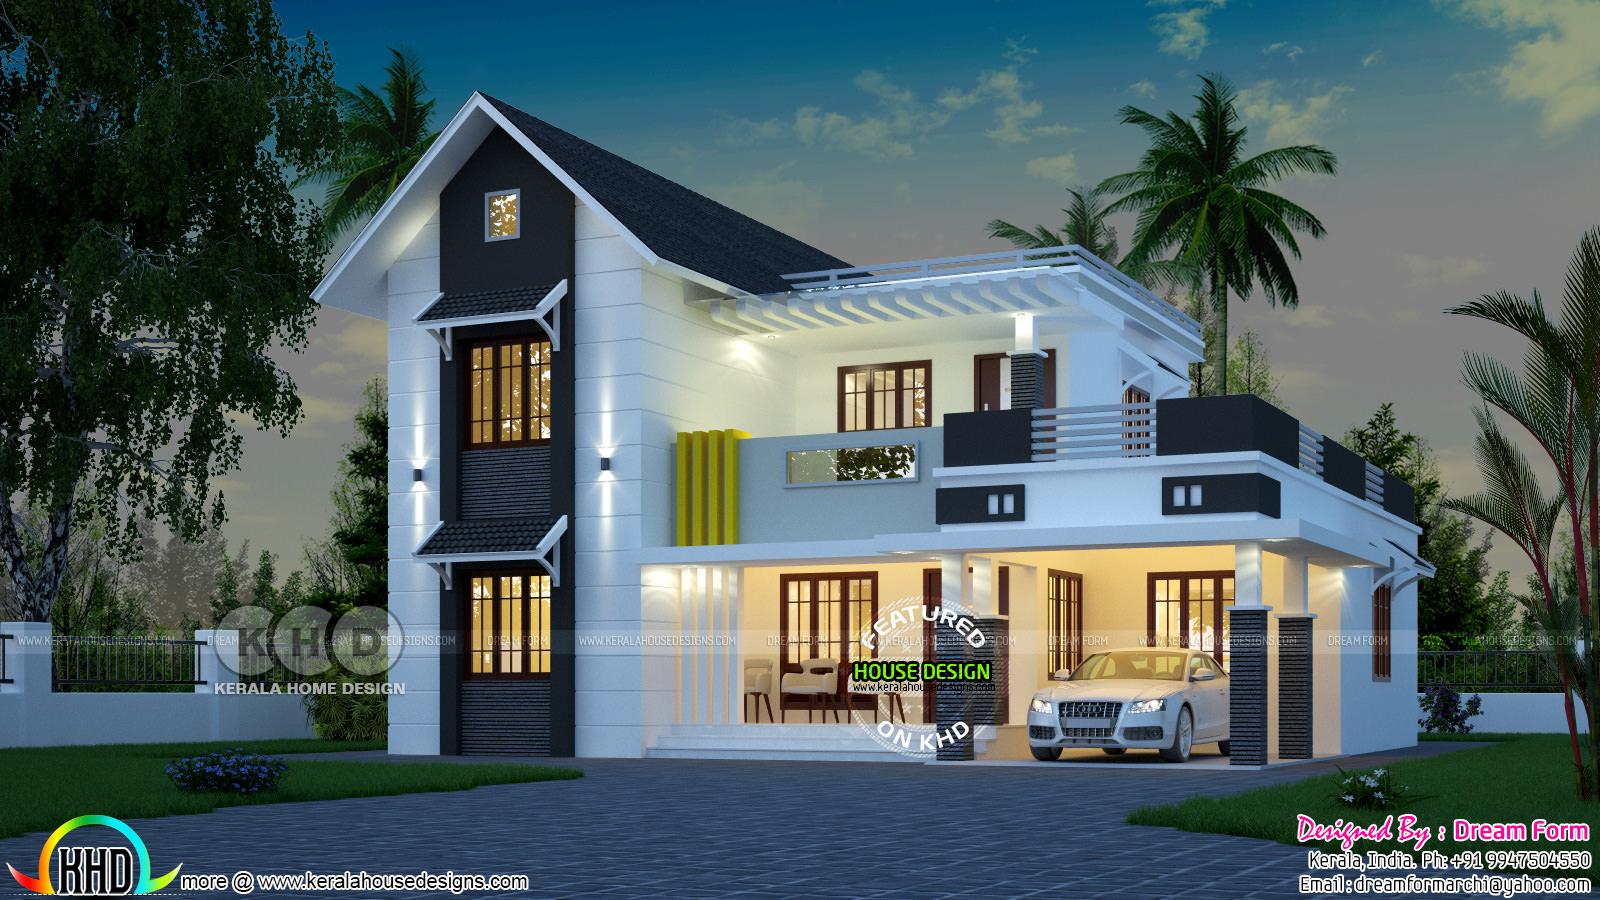 4 Bedroom Nice Looking Mixed Roof House Kerala Home